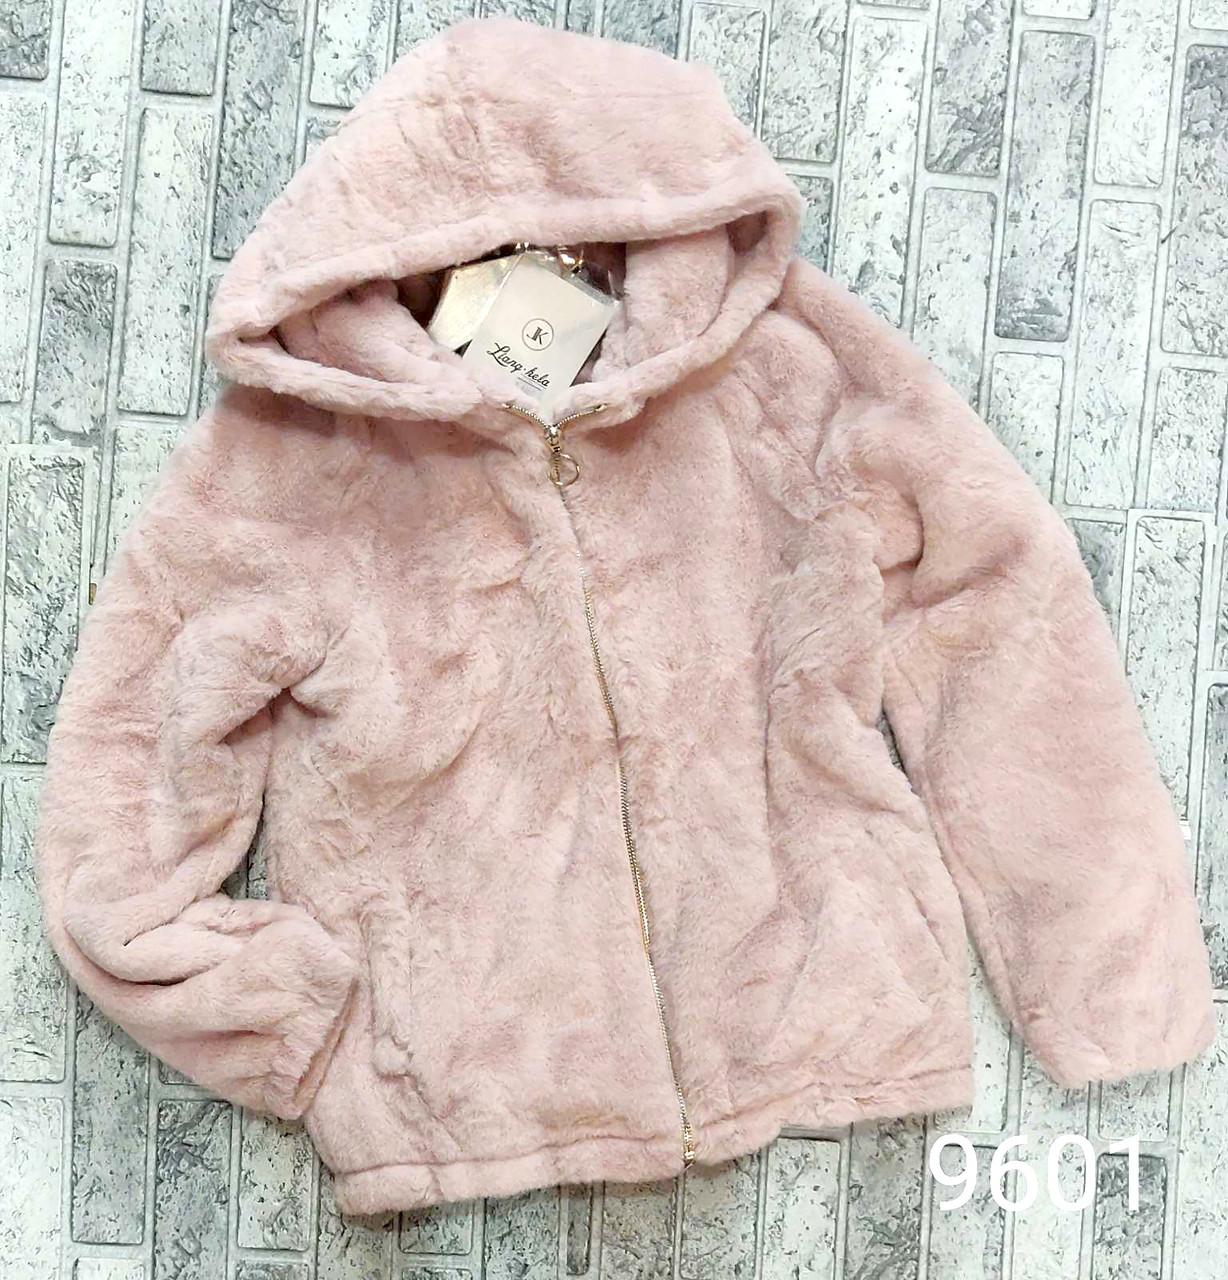 Мягкая женская куртка меховая M-L (в расцветках)